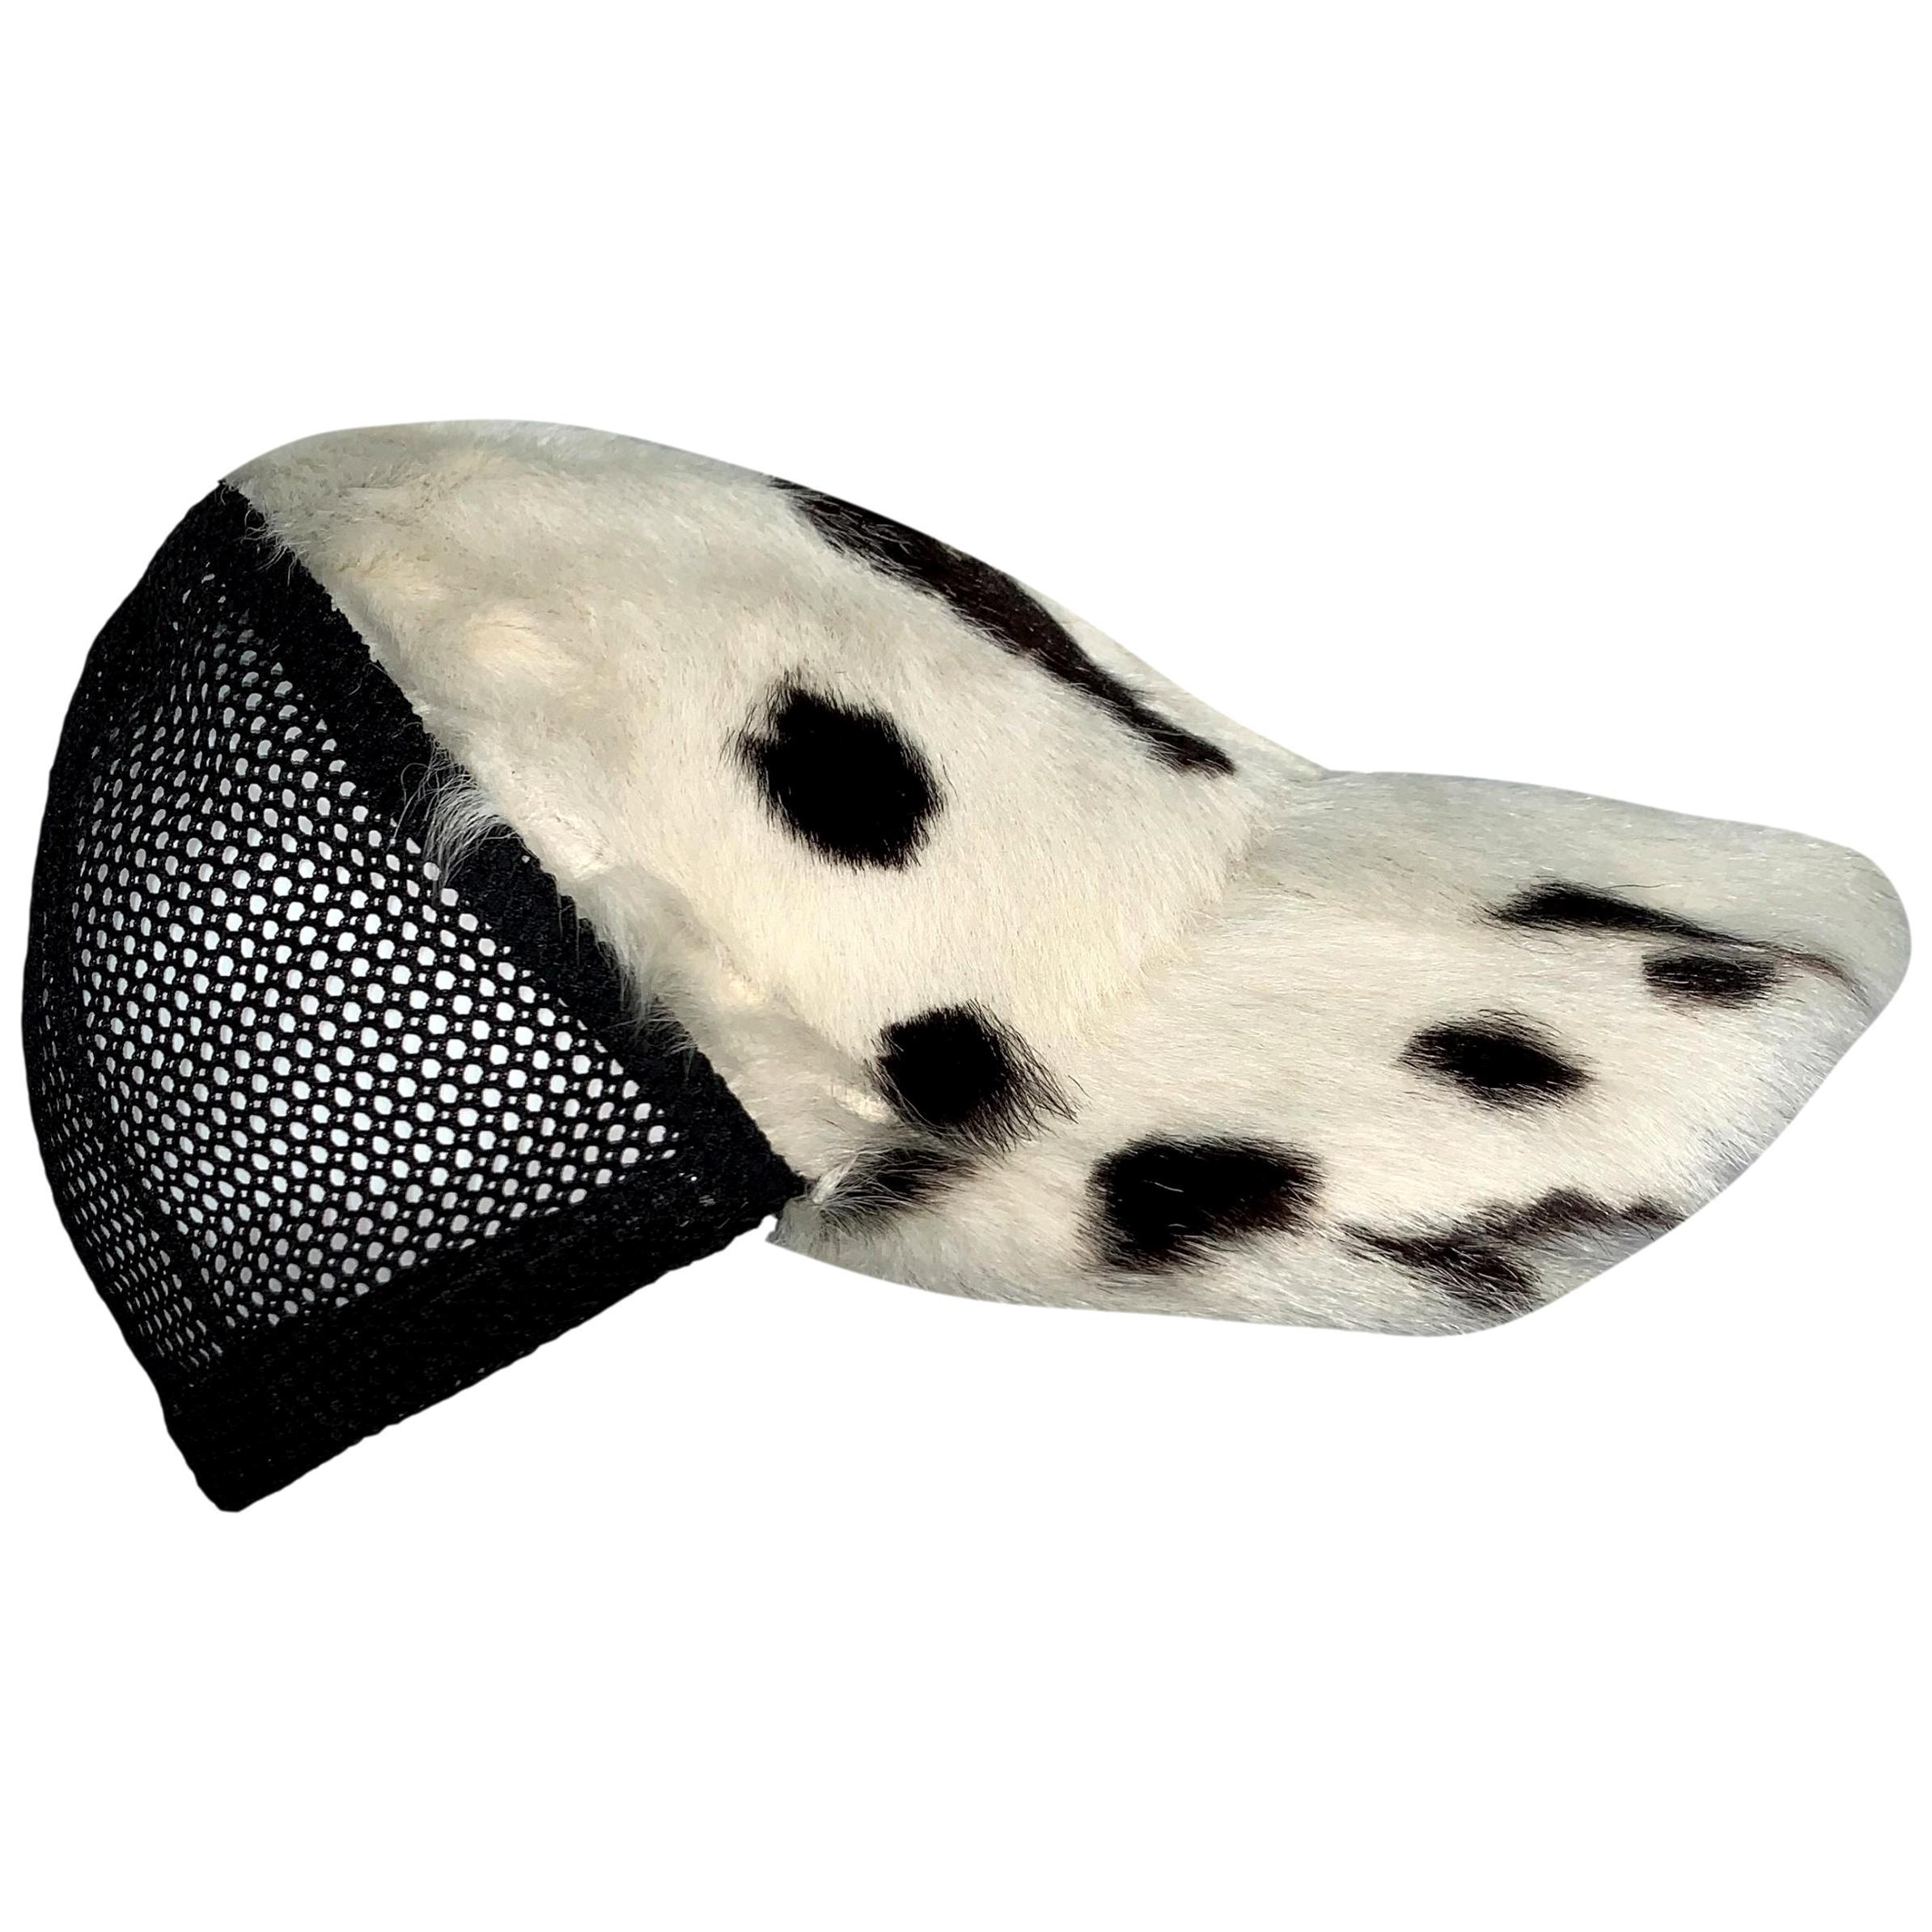 C. 2001 Christian Dior John Galliano Black White Fur Trucker Baseball Cap Hat